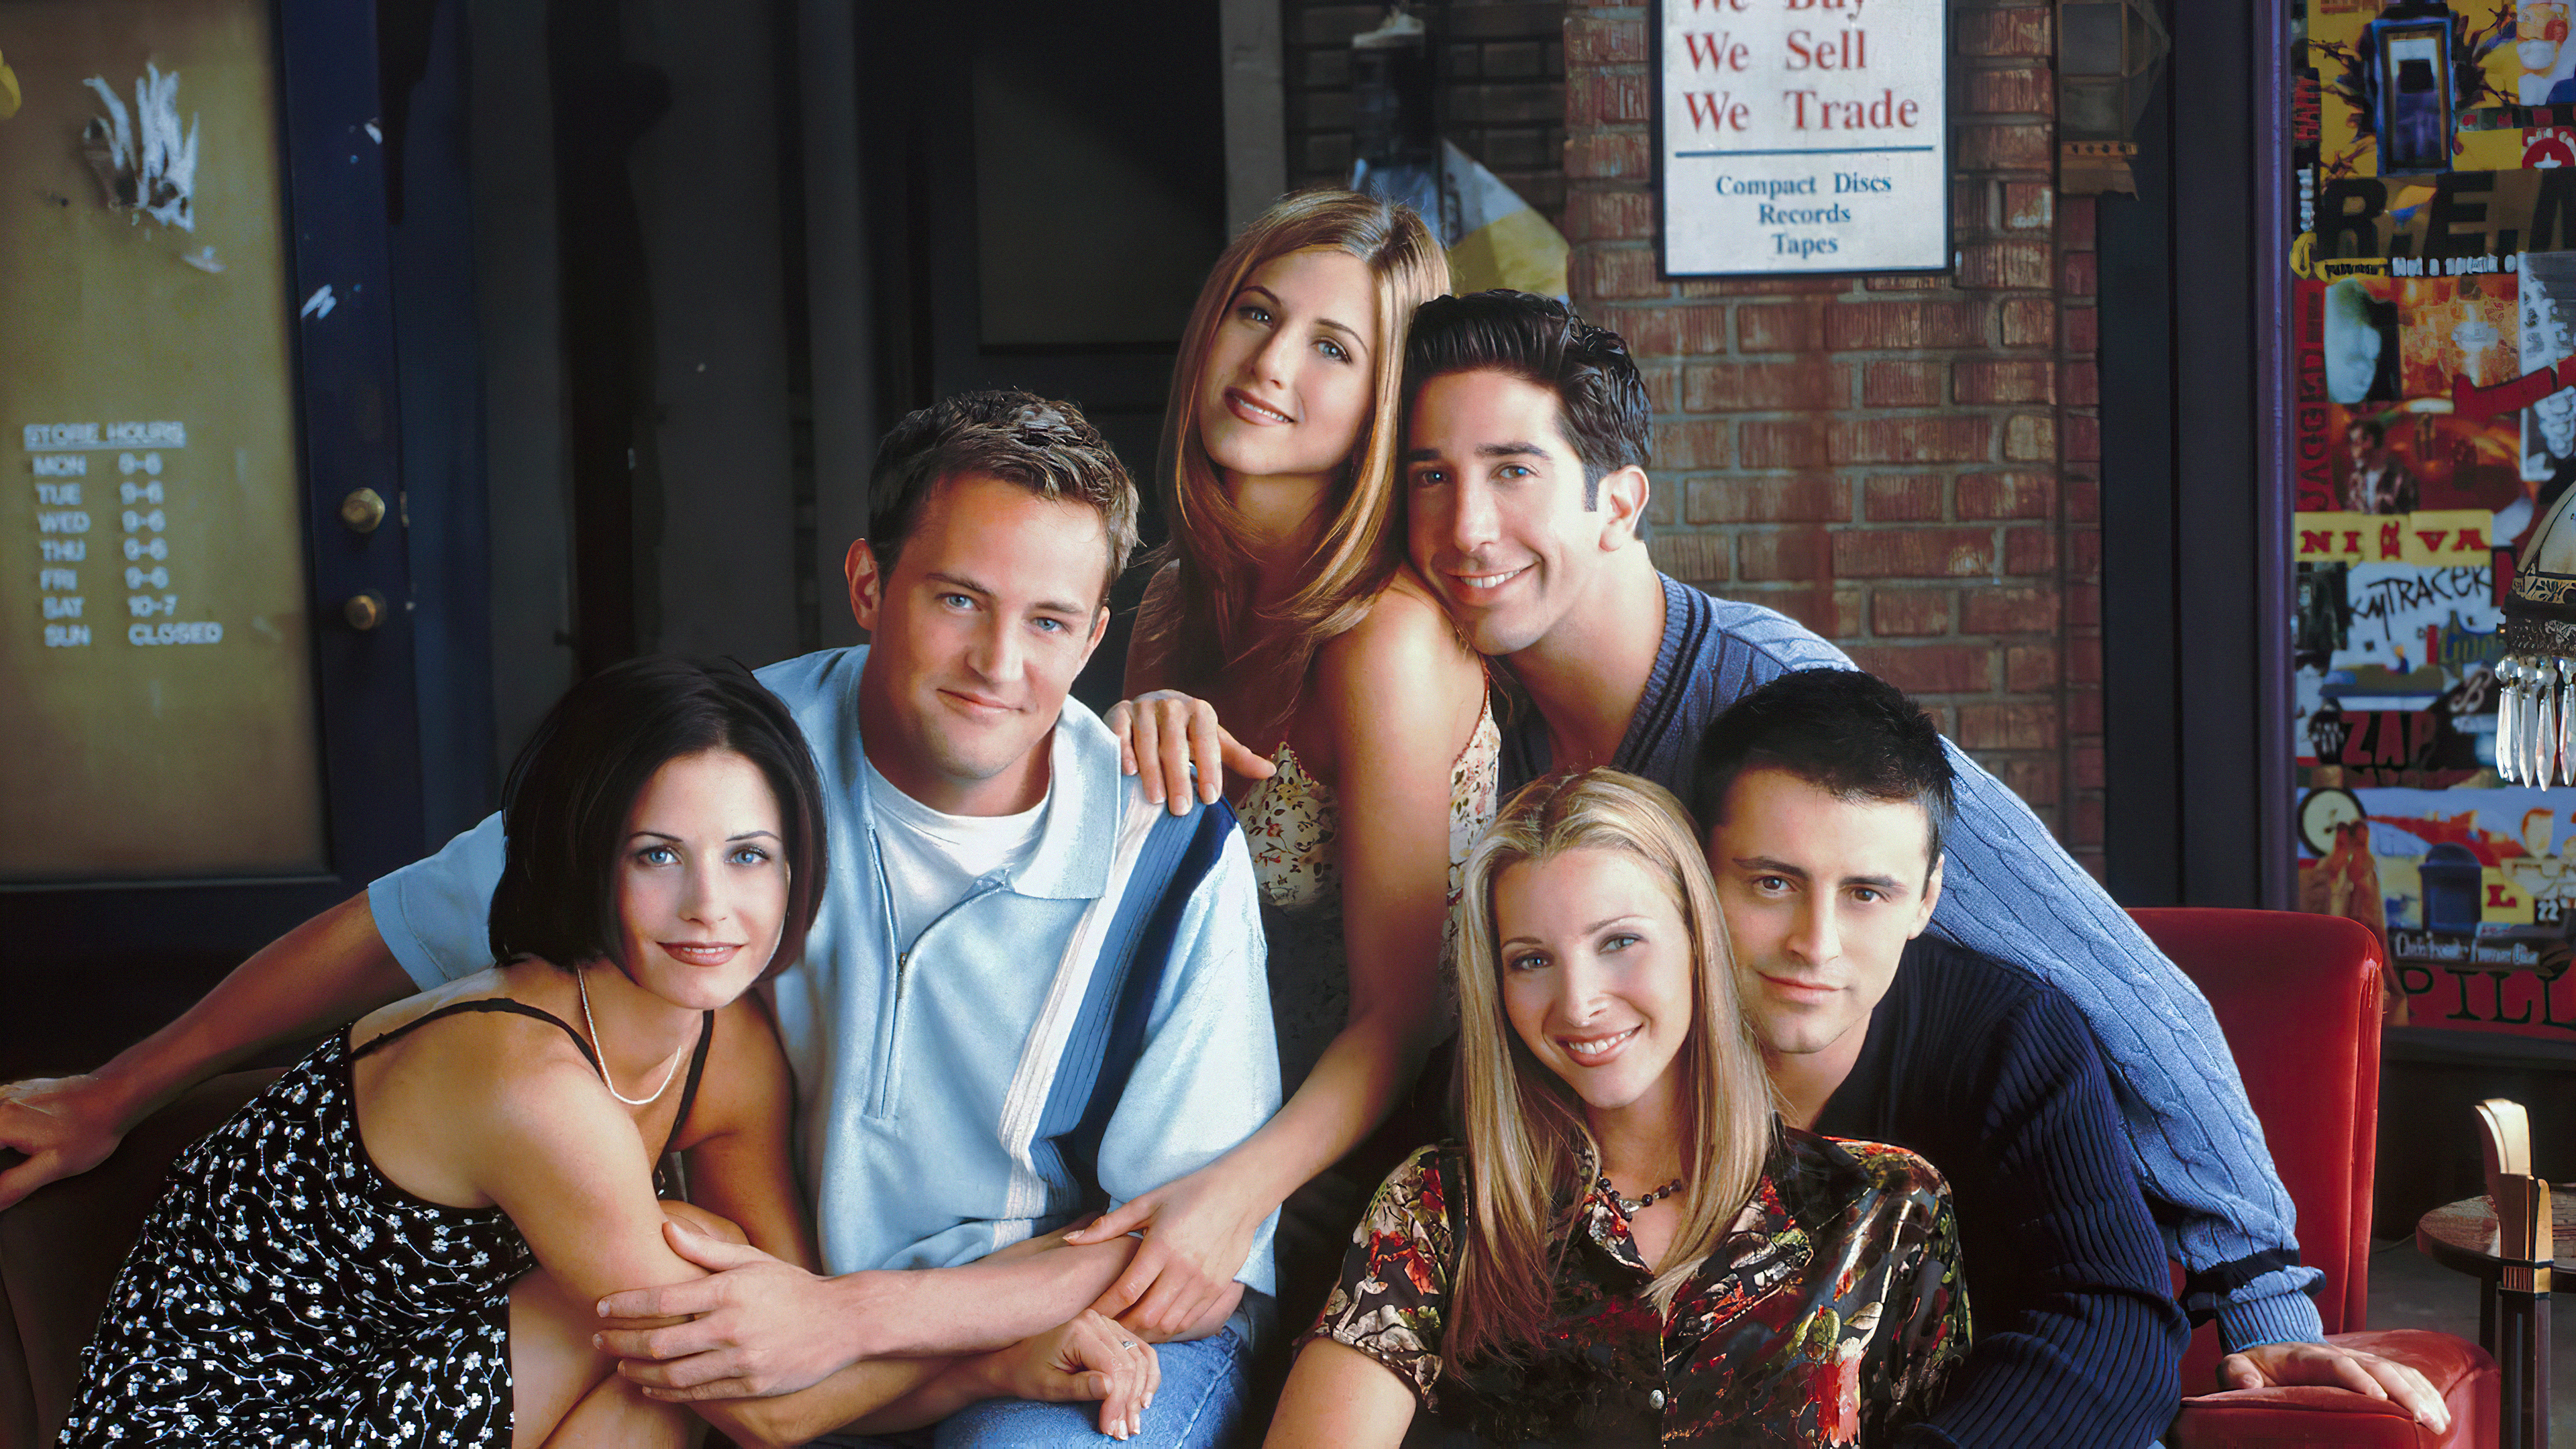 Fondos de pantalla Serie Friends